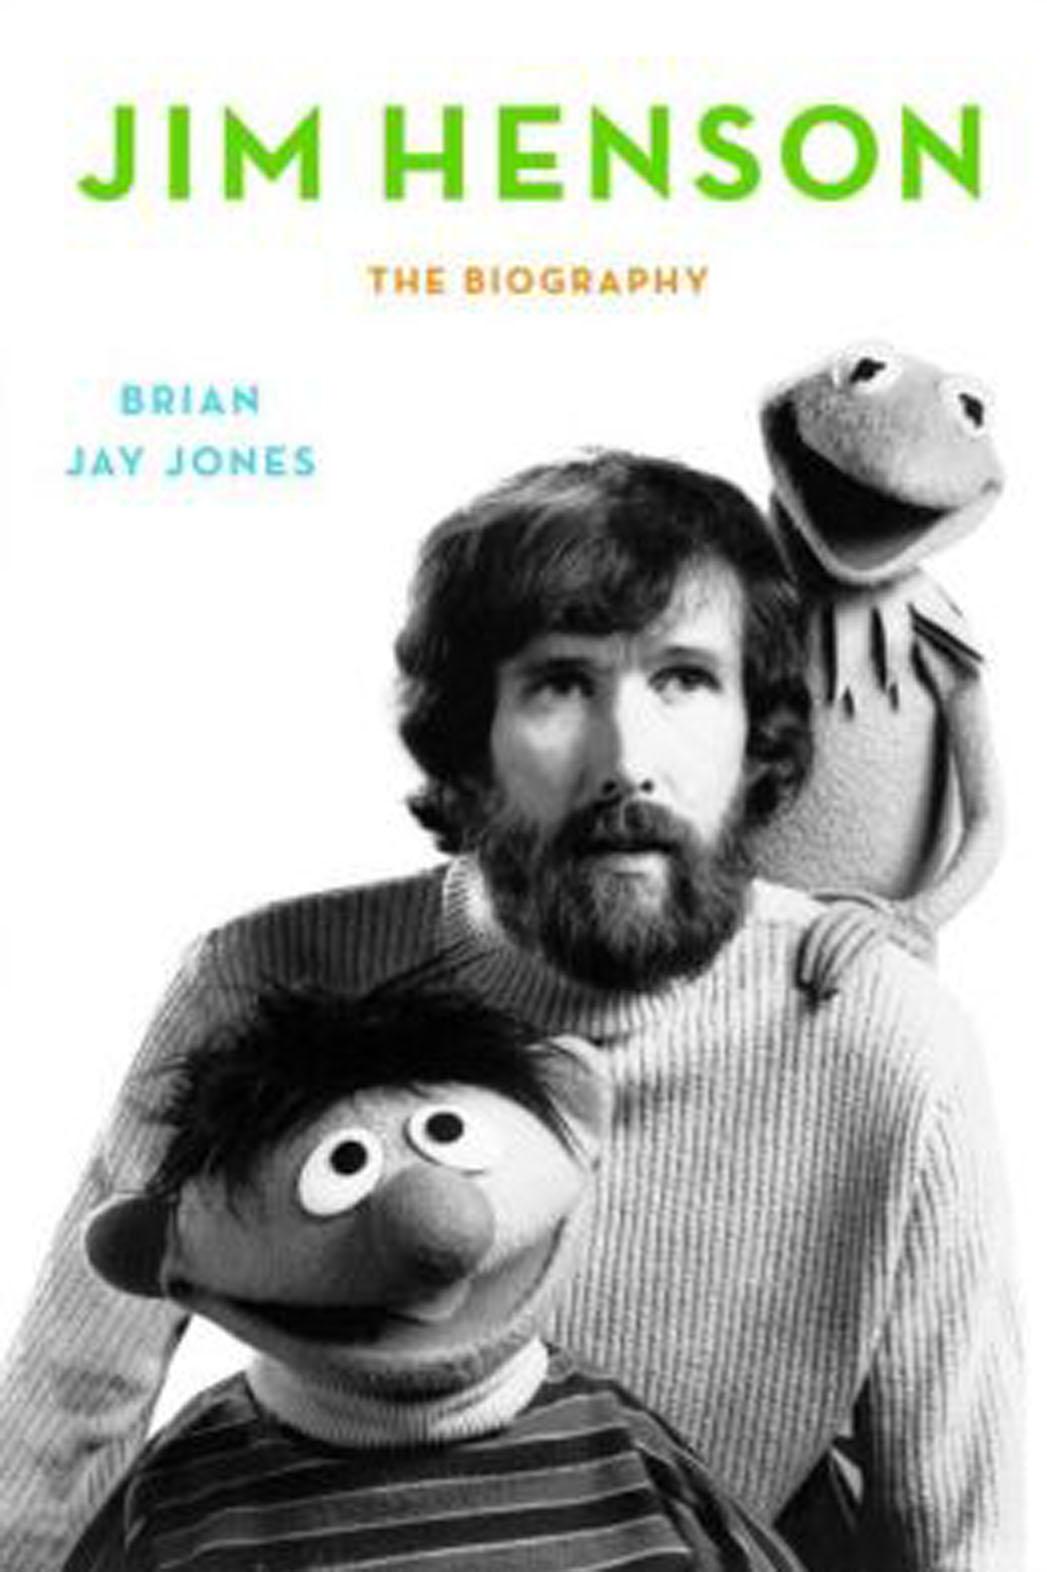 'Jim Henson: The Biography' By Brian Jay Jones